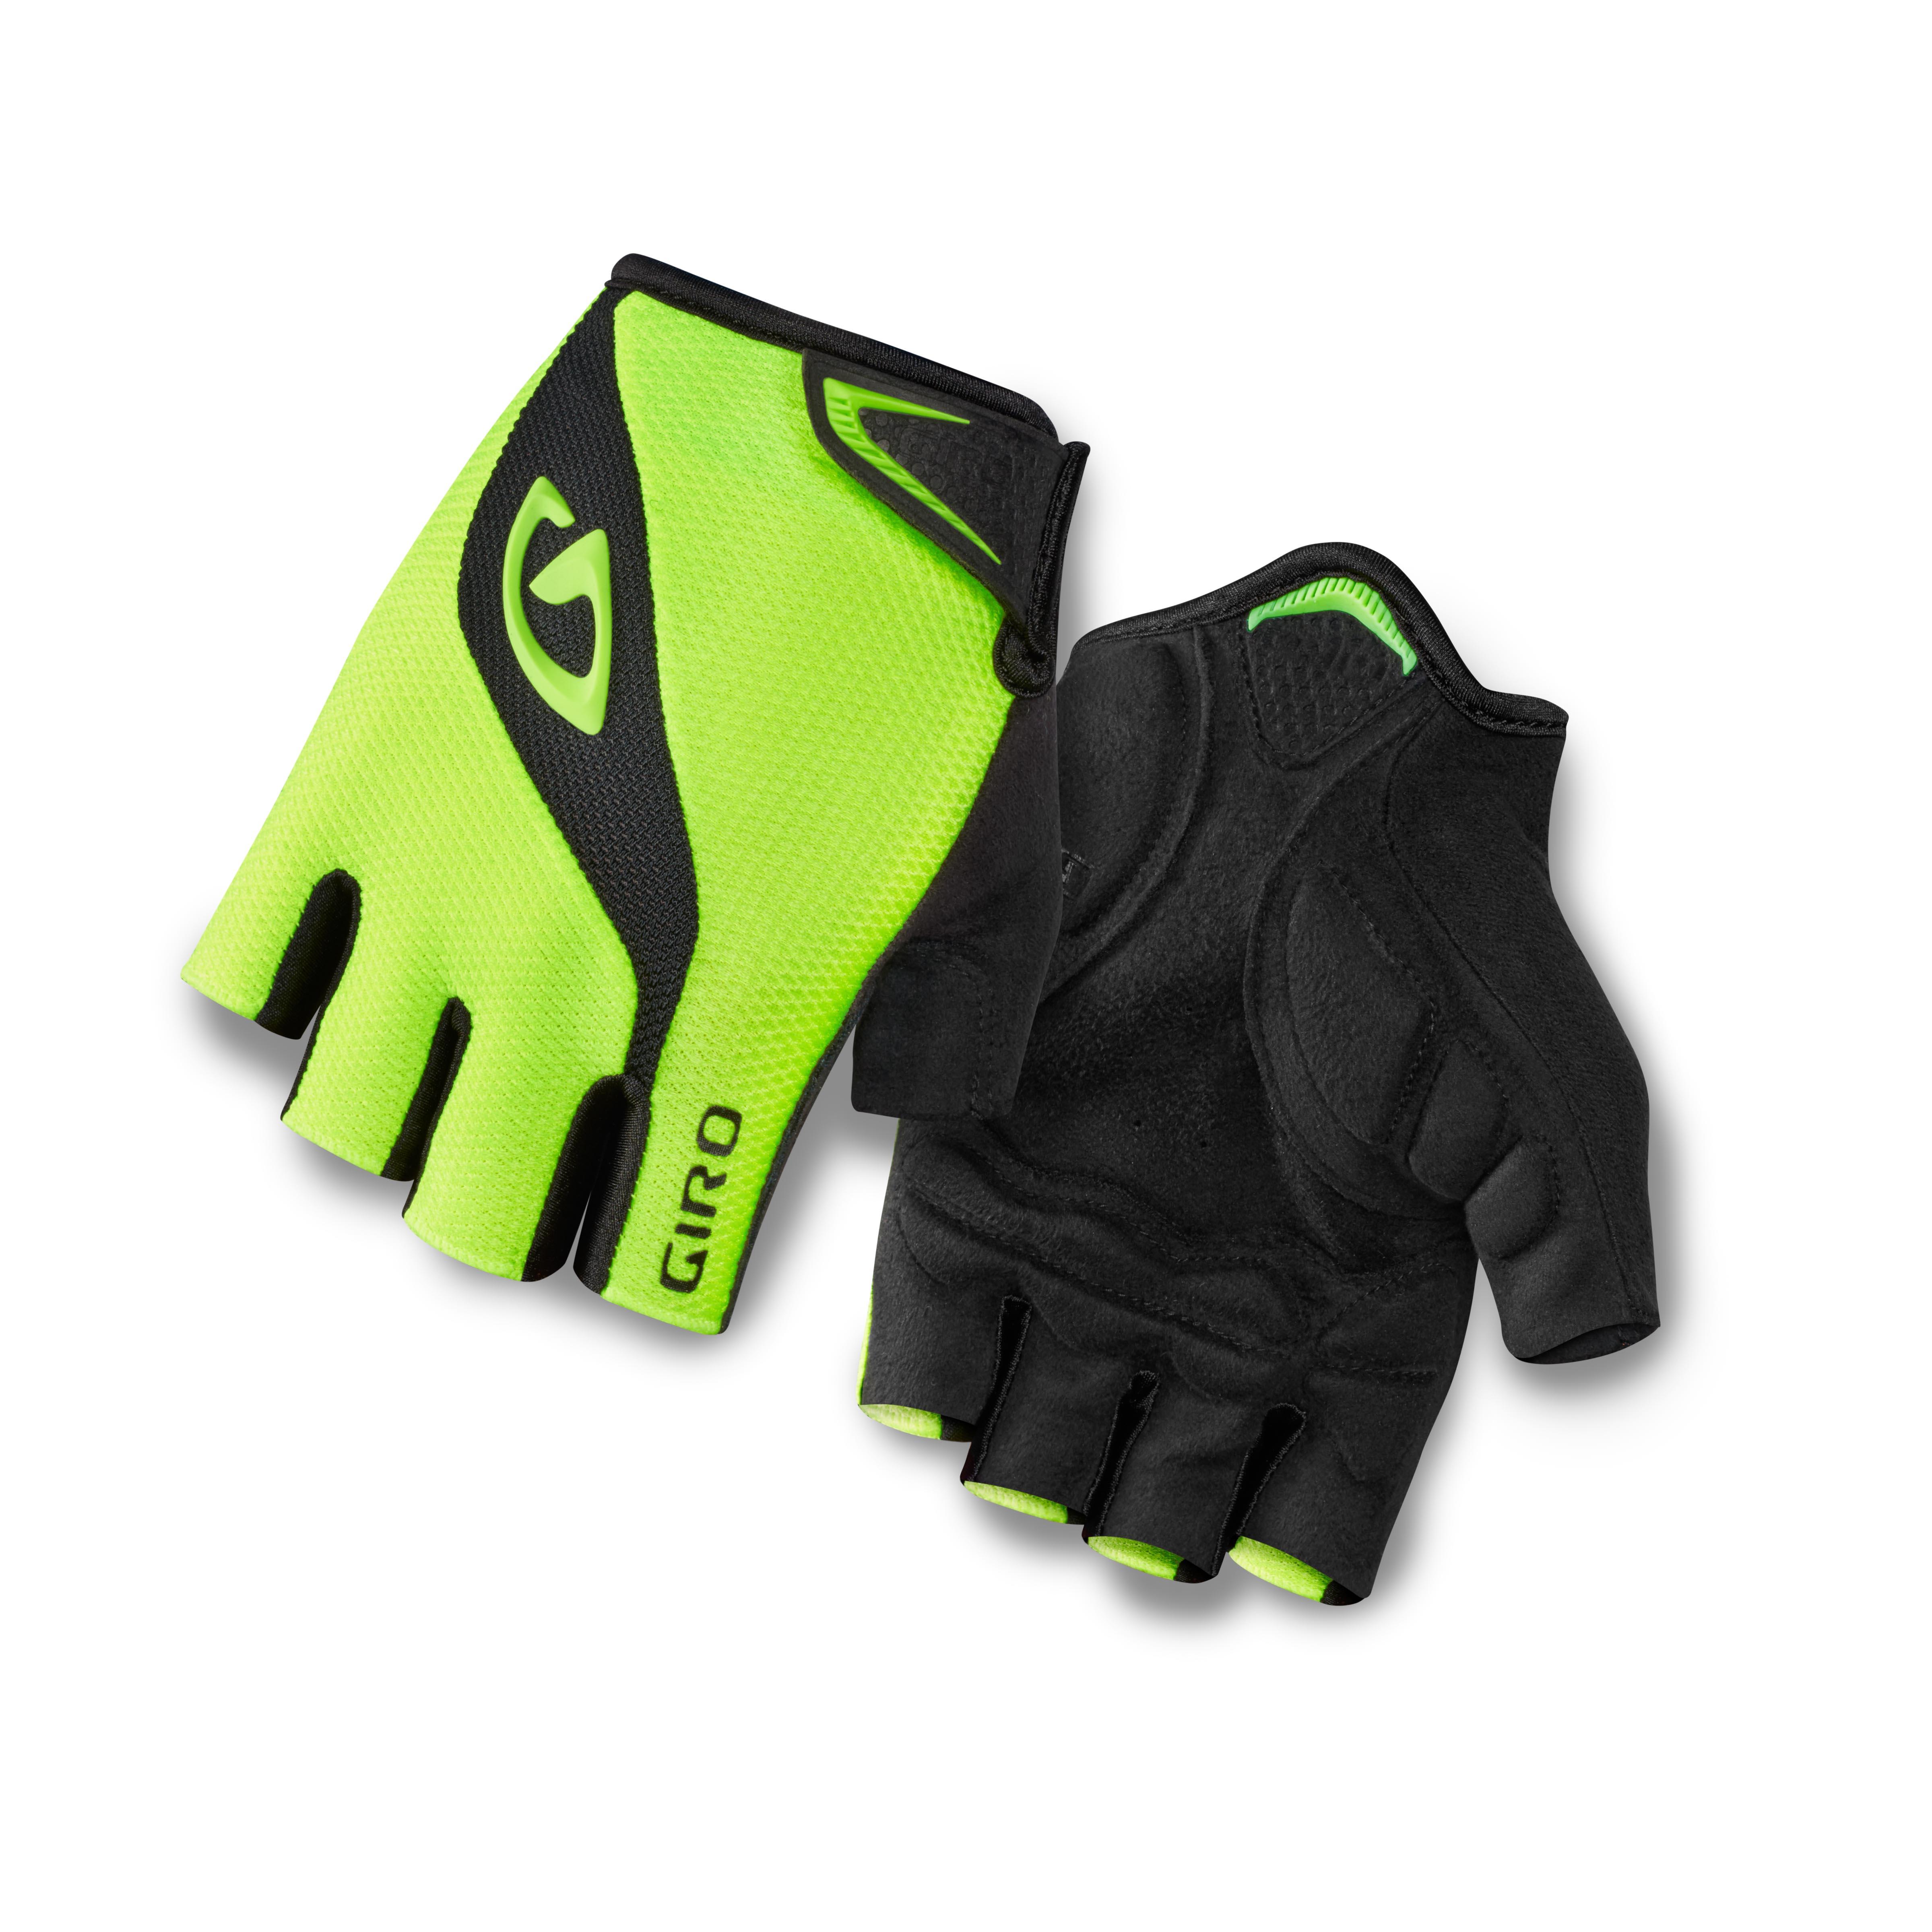 Giro Softgoods Handske Bravo Fluo Gul/Sort XXL NEON GUL XXL | Gloves